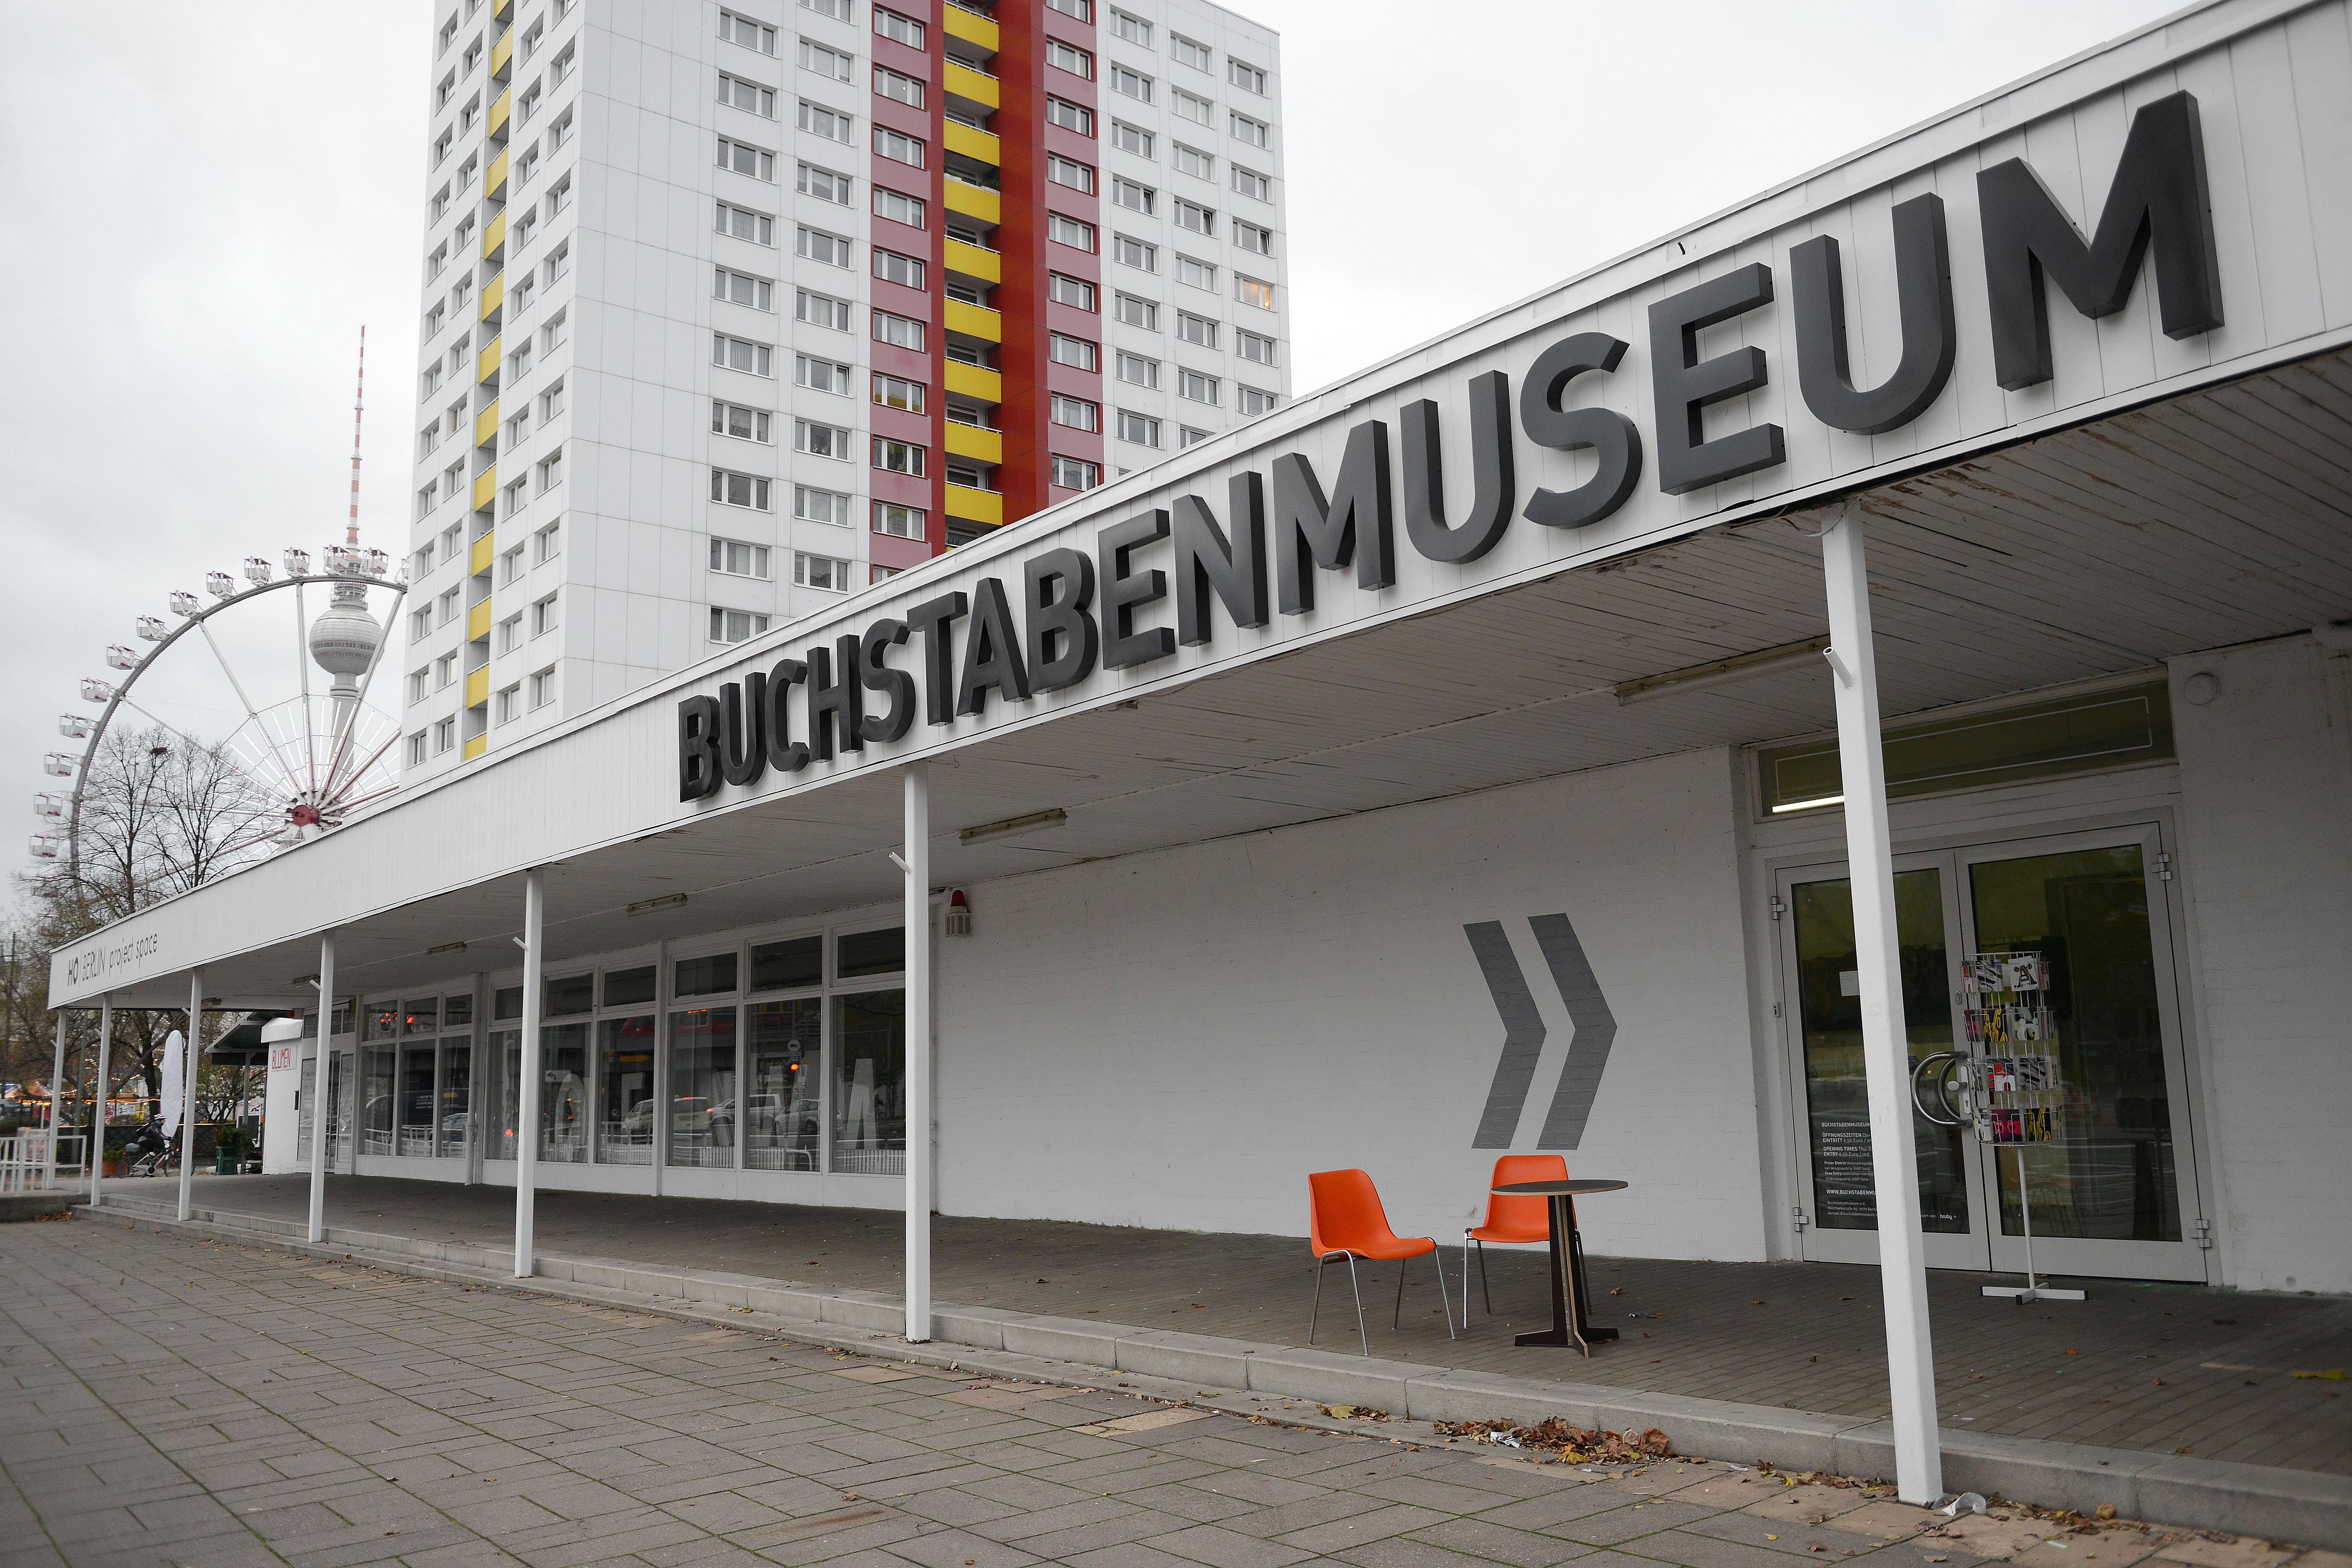 Buchstabenmuseum Berlin - GowithOh